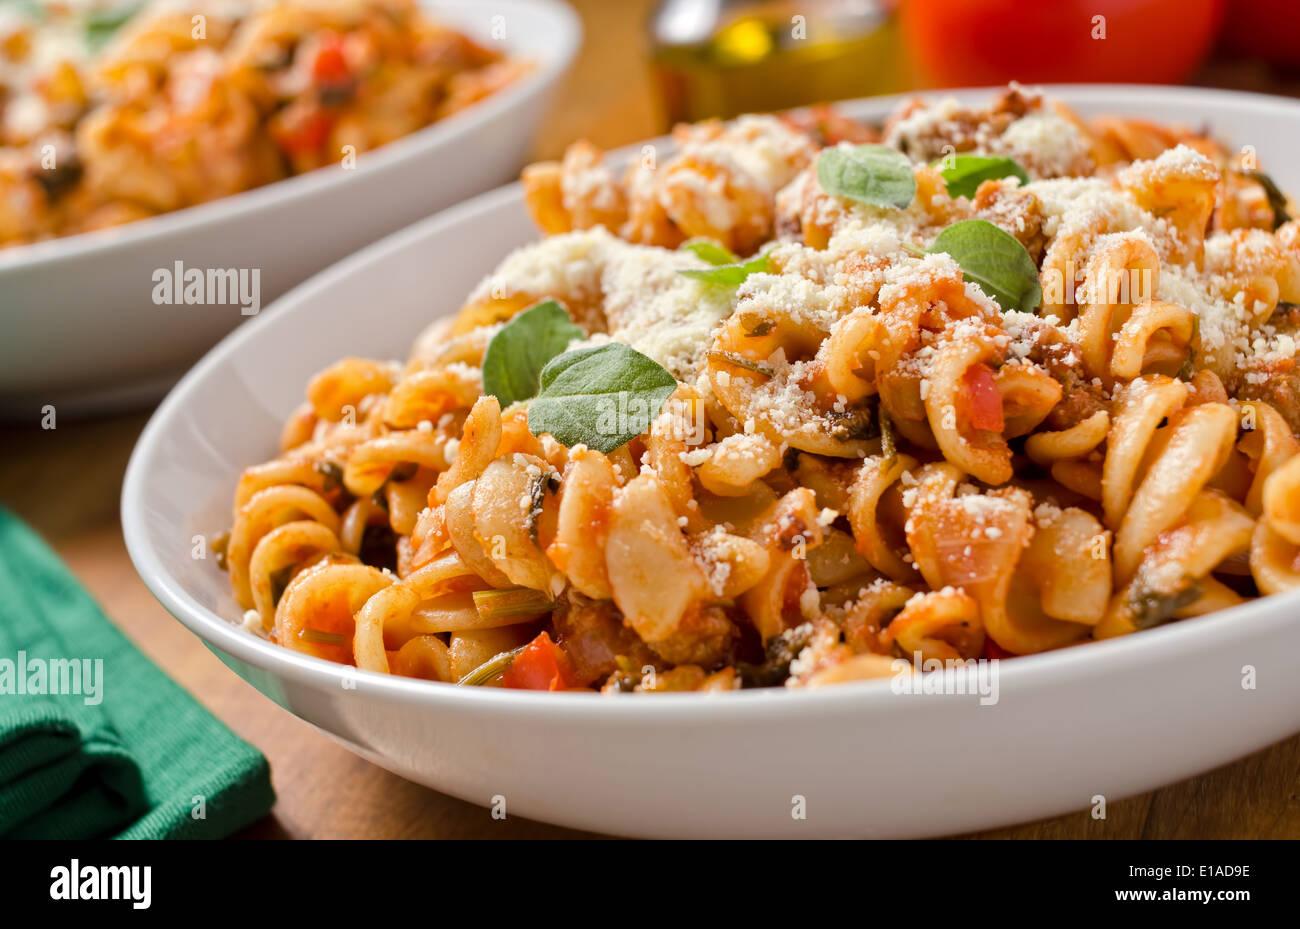 Rotini pasta with marinara sauce, parmesan cheese, and fresh basil. - Stock Image